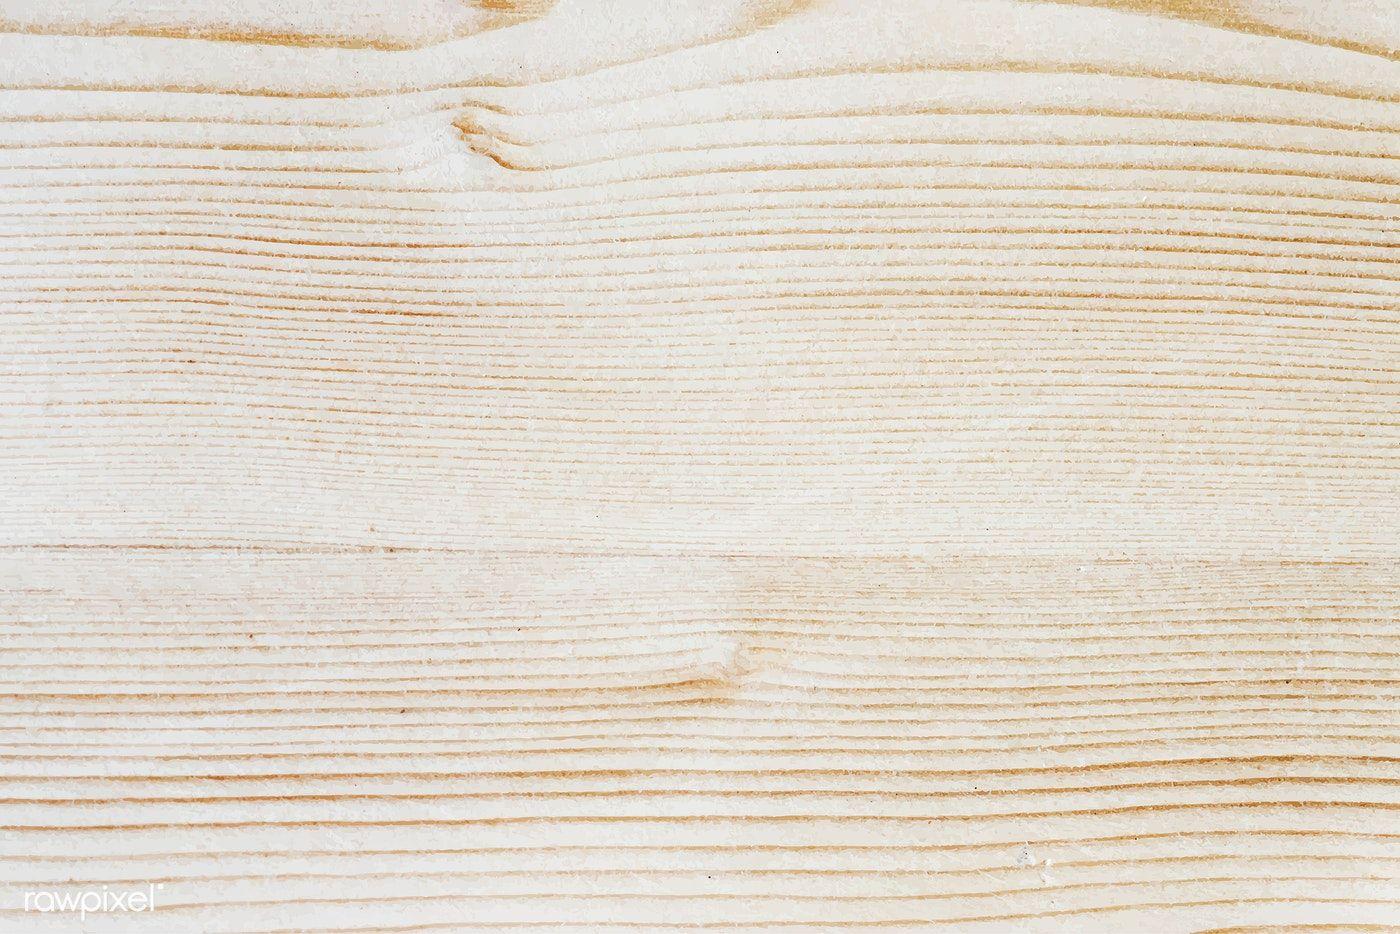 Download Premium Vector Of Beige Wooden Plank Textured Background Vector Art And Craft Videos Arts And Crafts For Teens Arts And Crafts For Adults